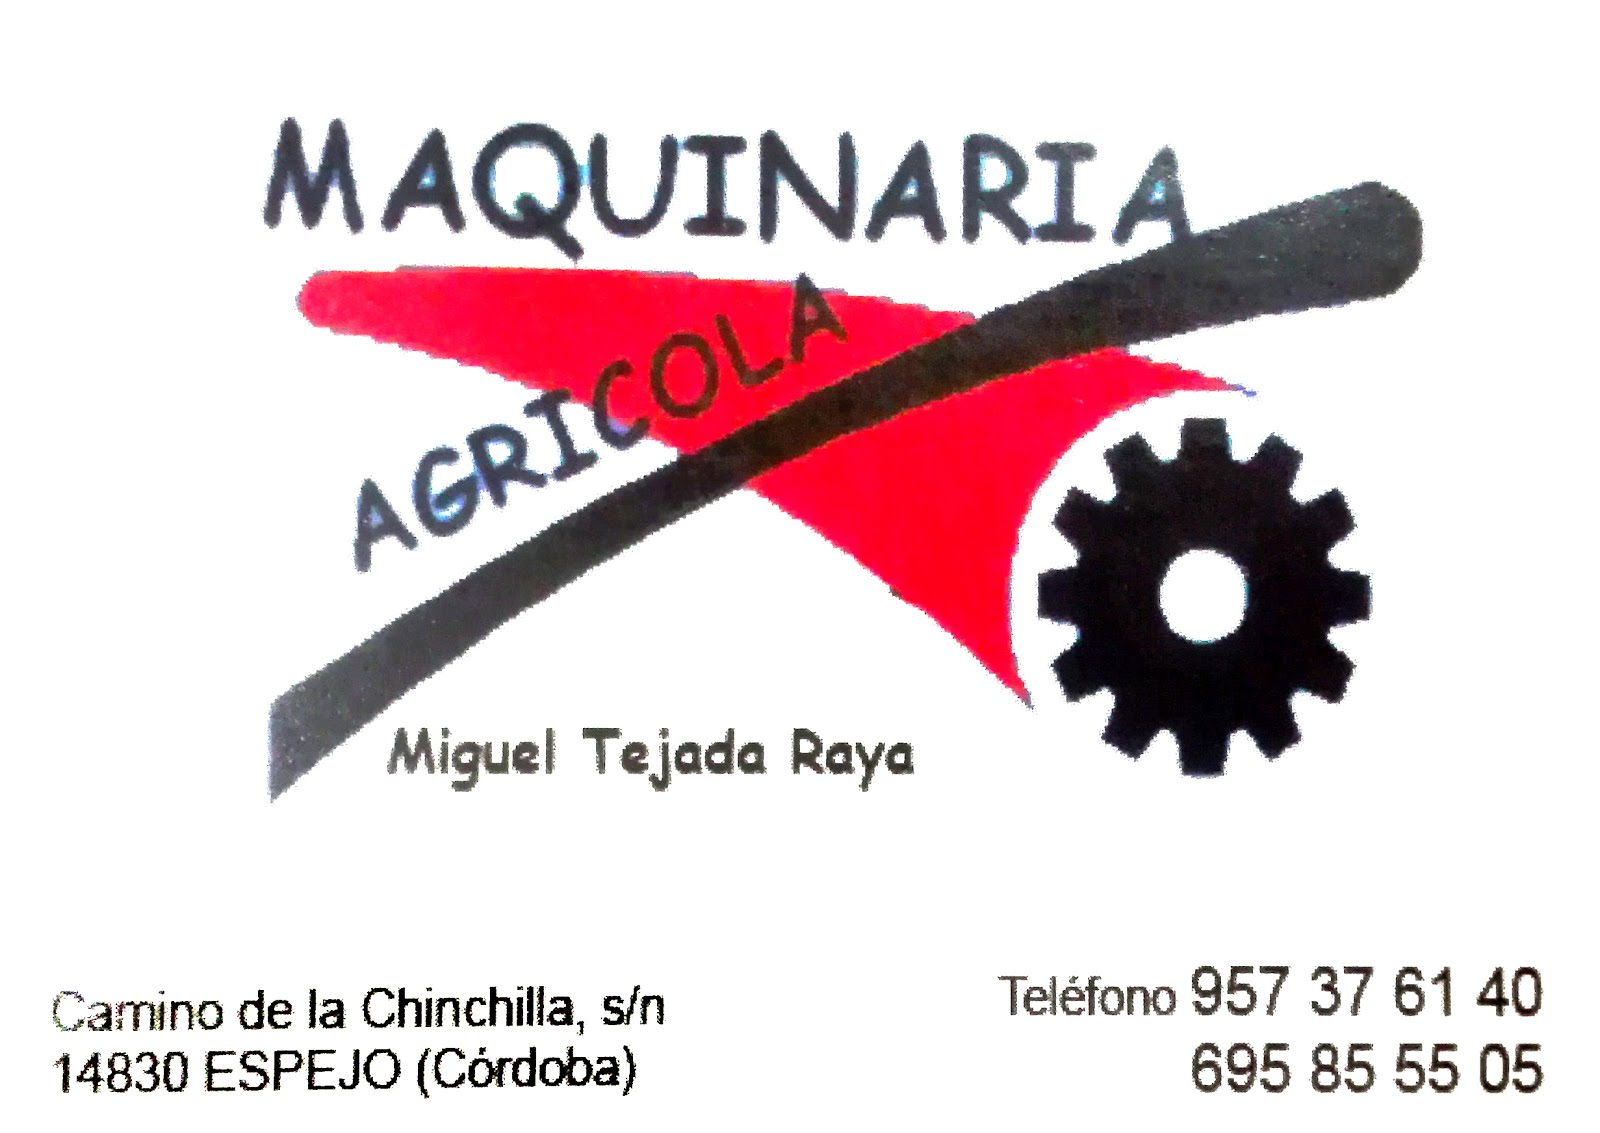 Maquinaria Miguel Tejada